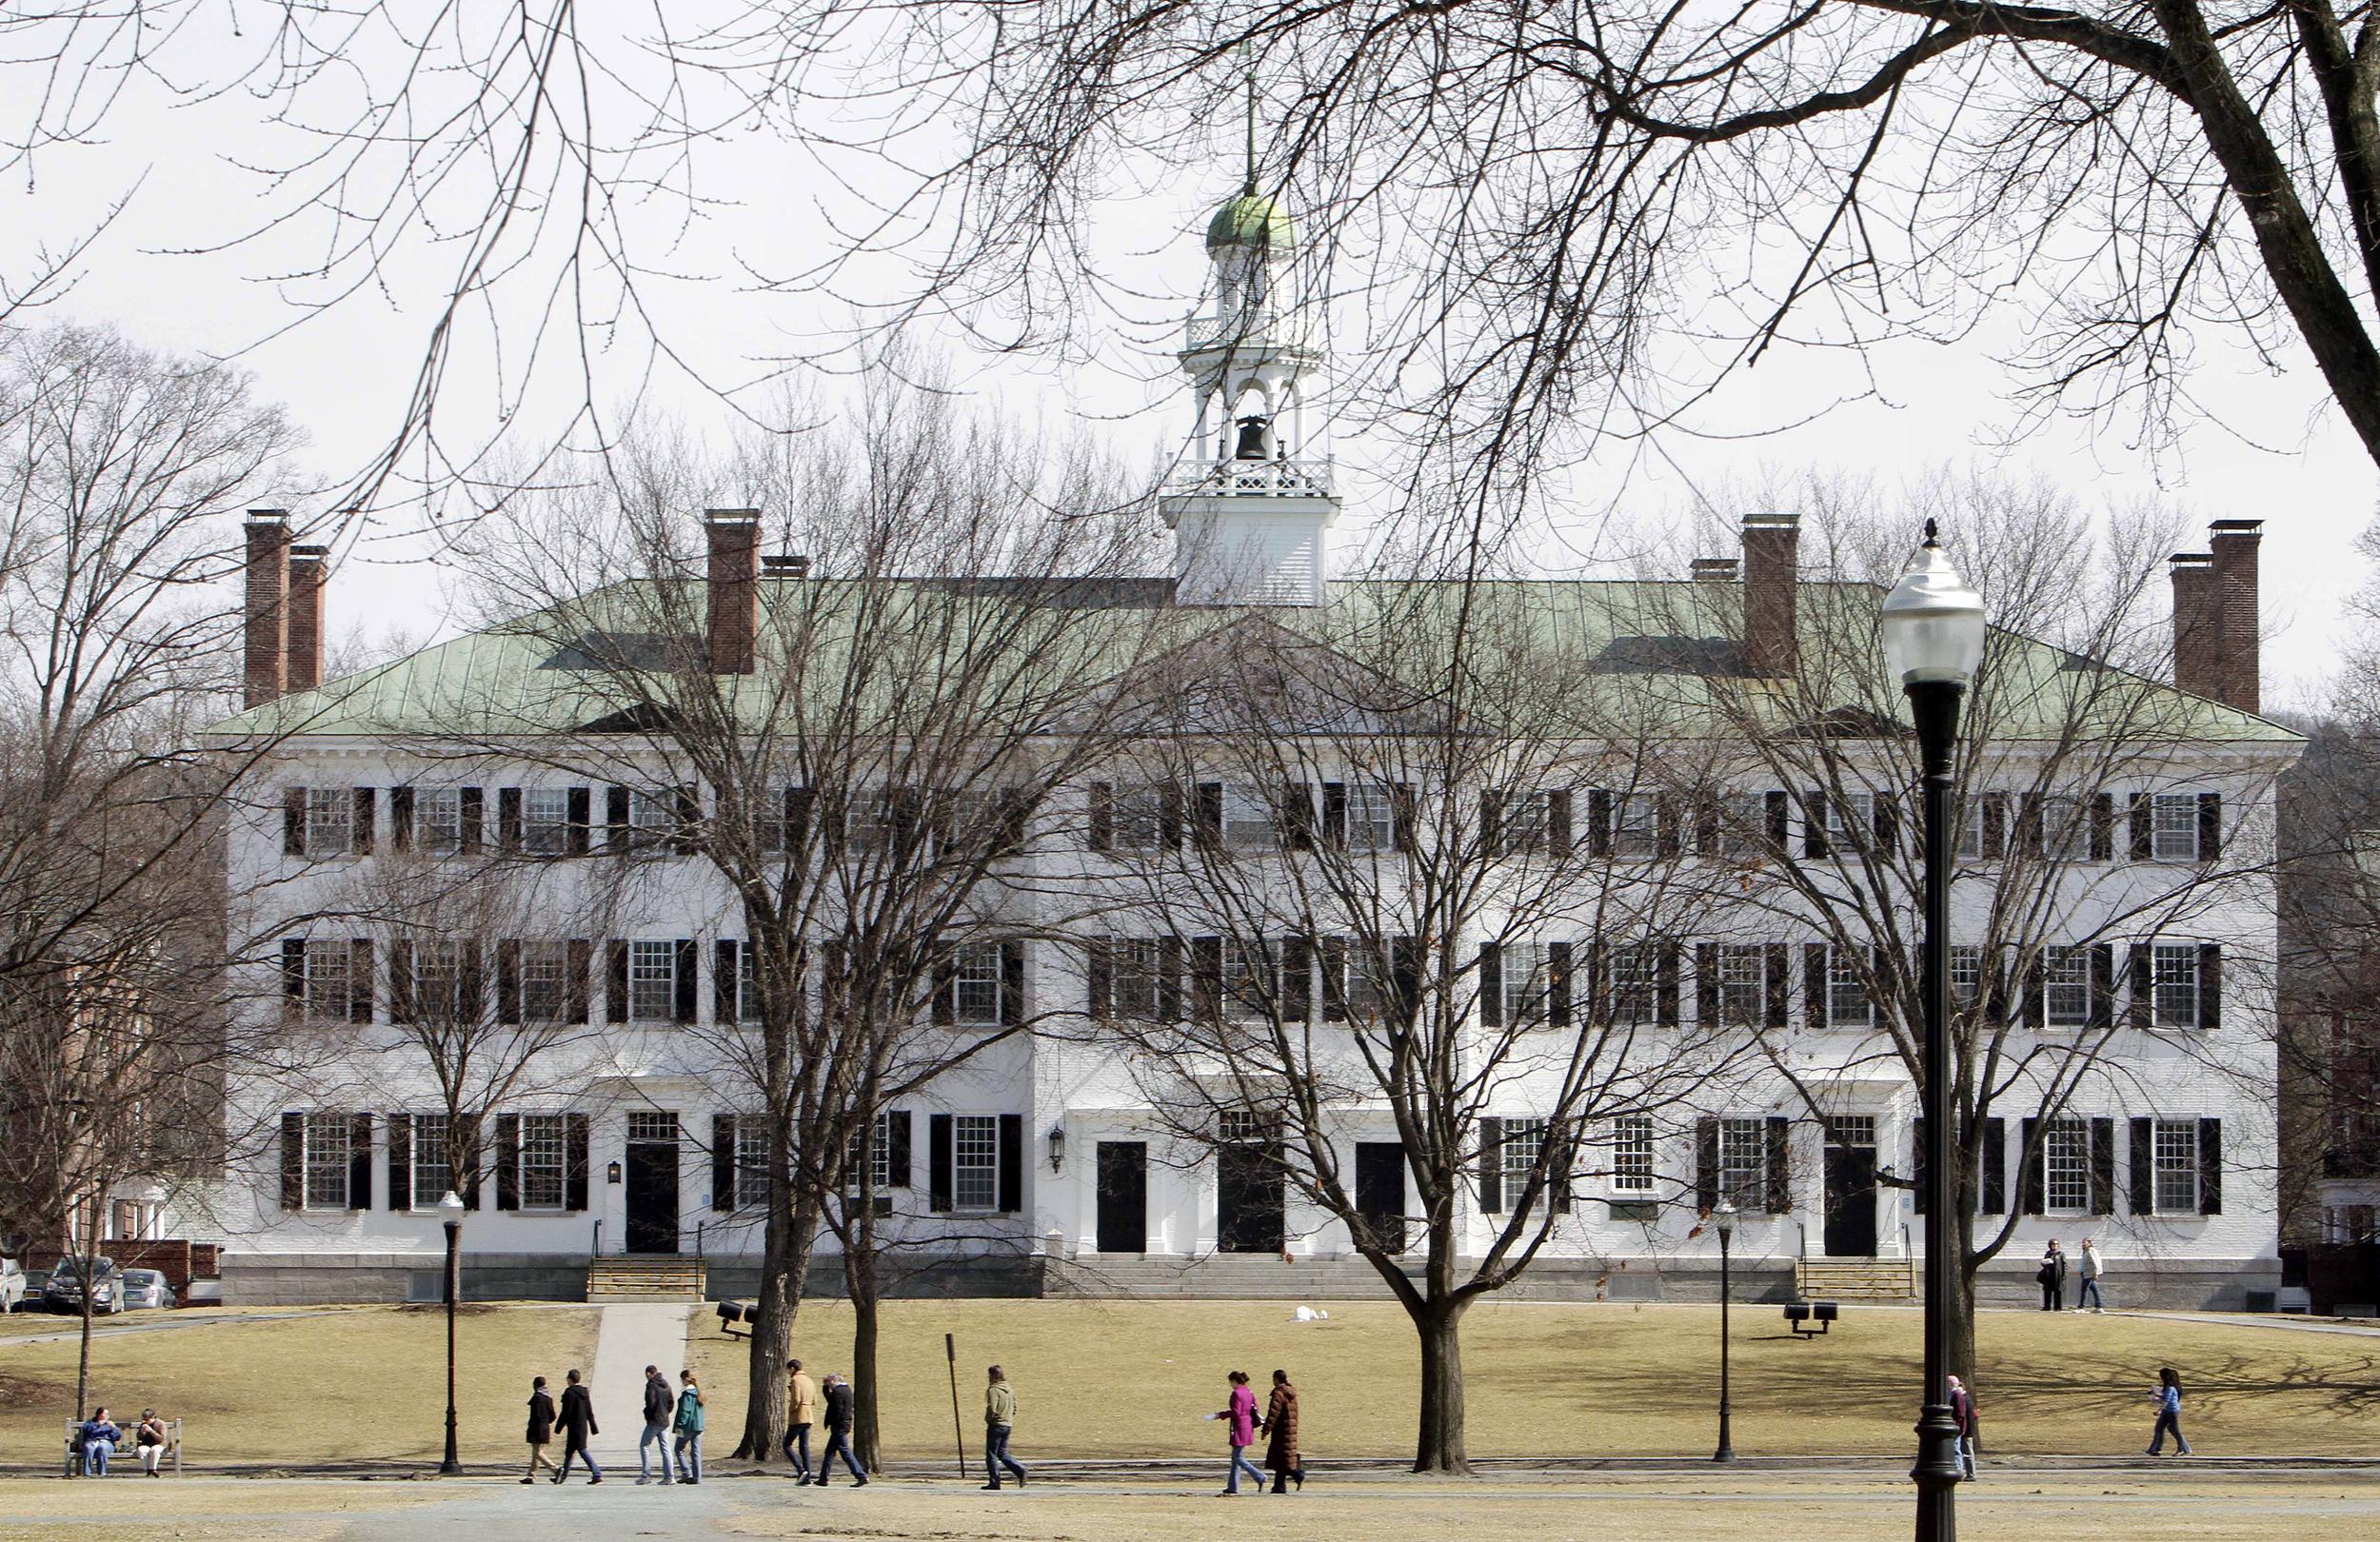 Image: Dartmouth College